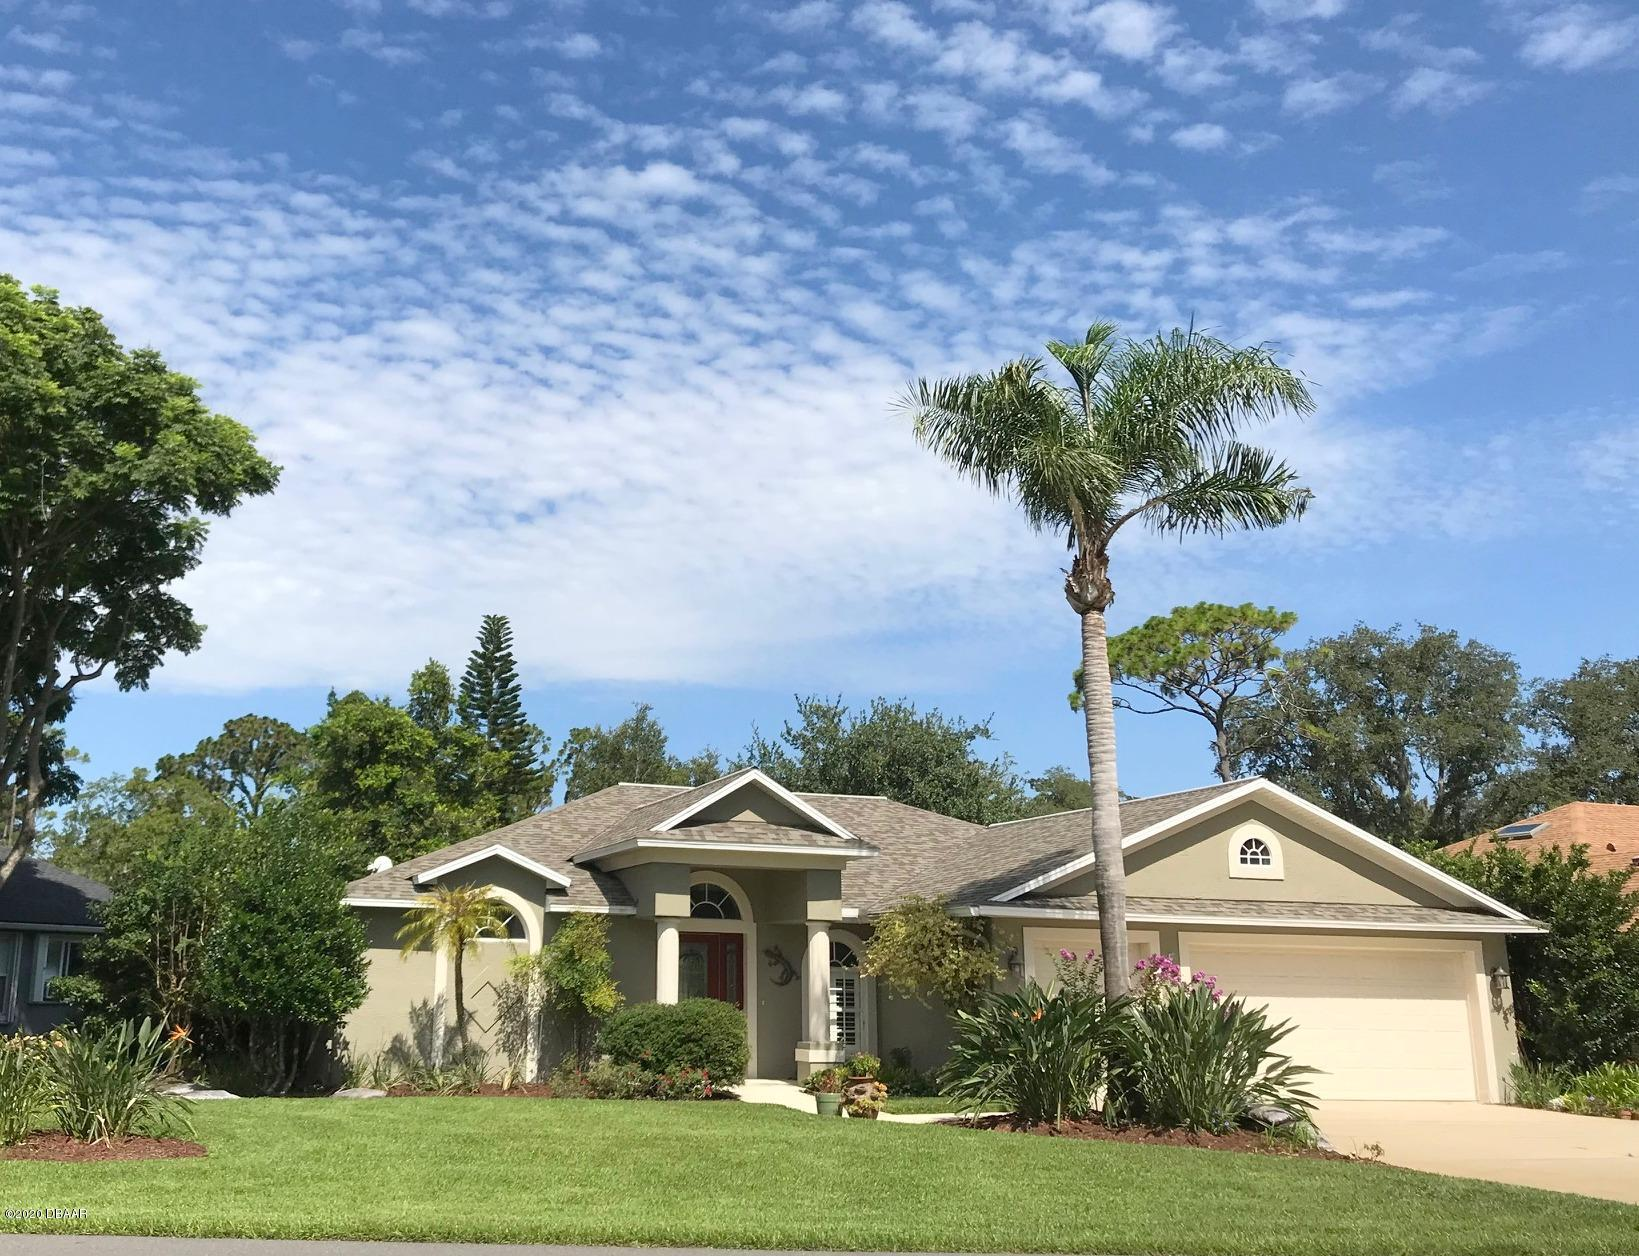 Photo of 55 Lazy 8 Drive, Port Orange, FL 32128